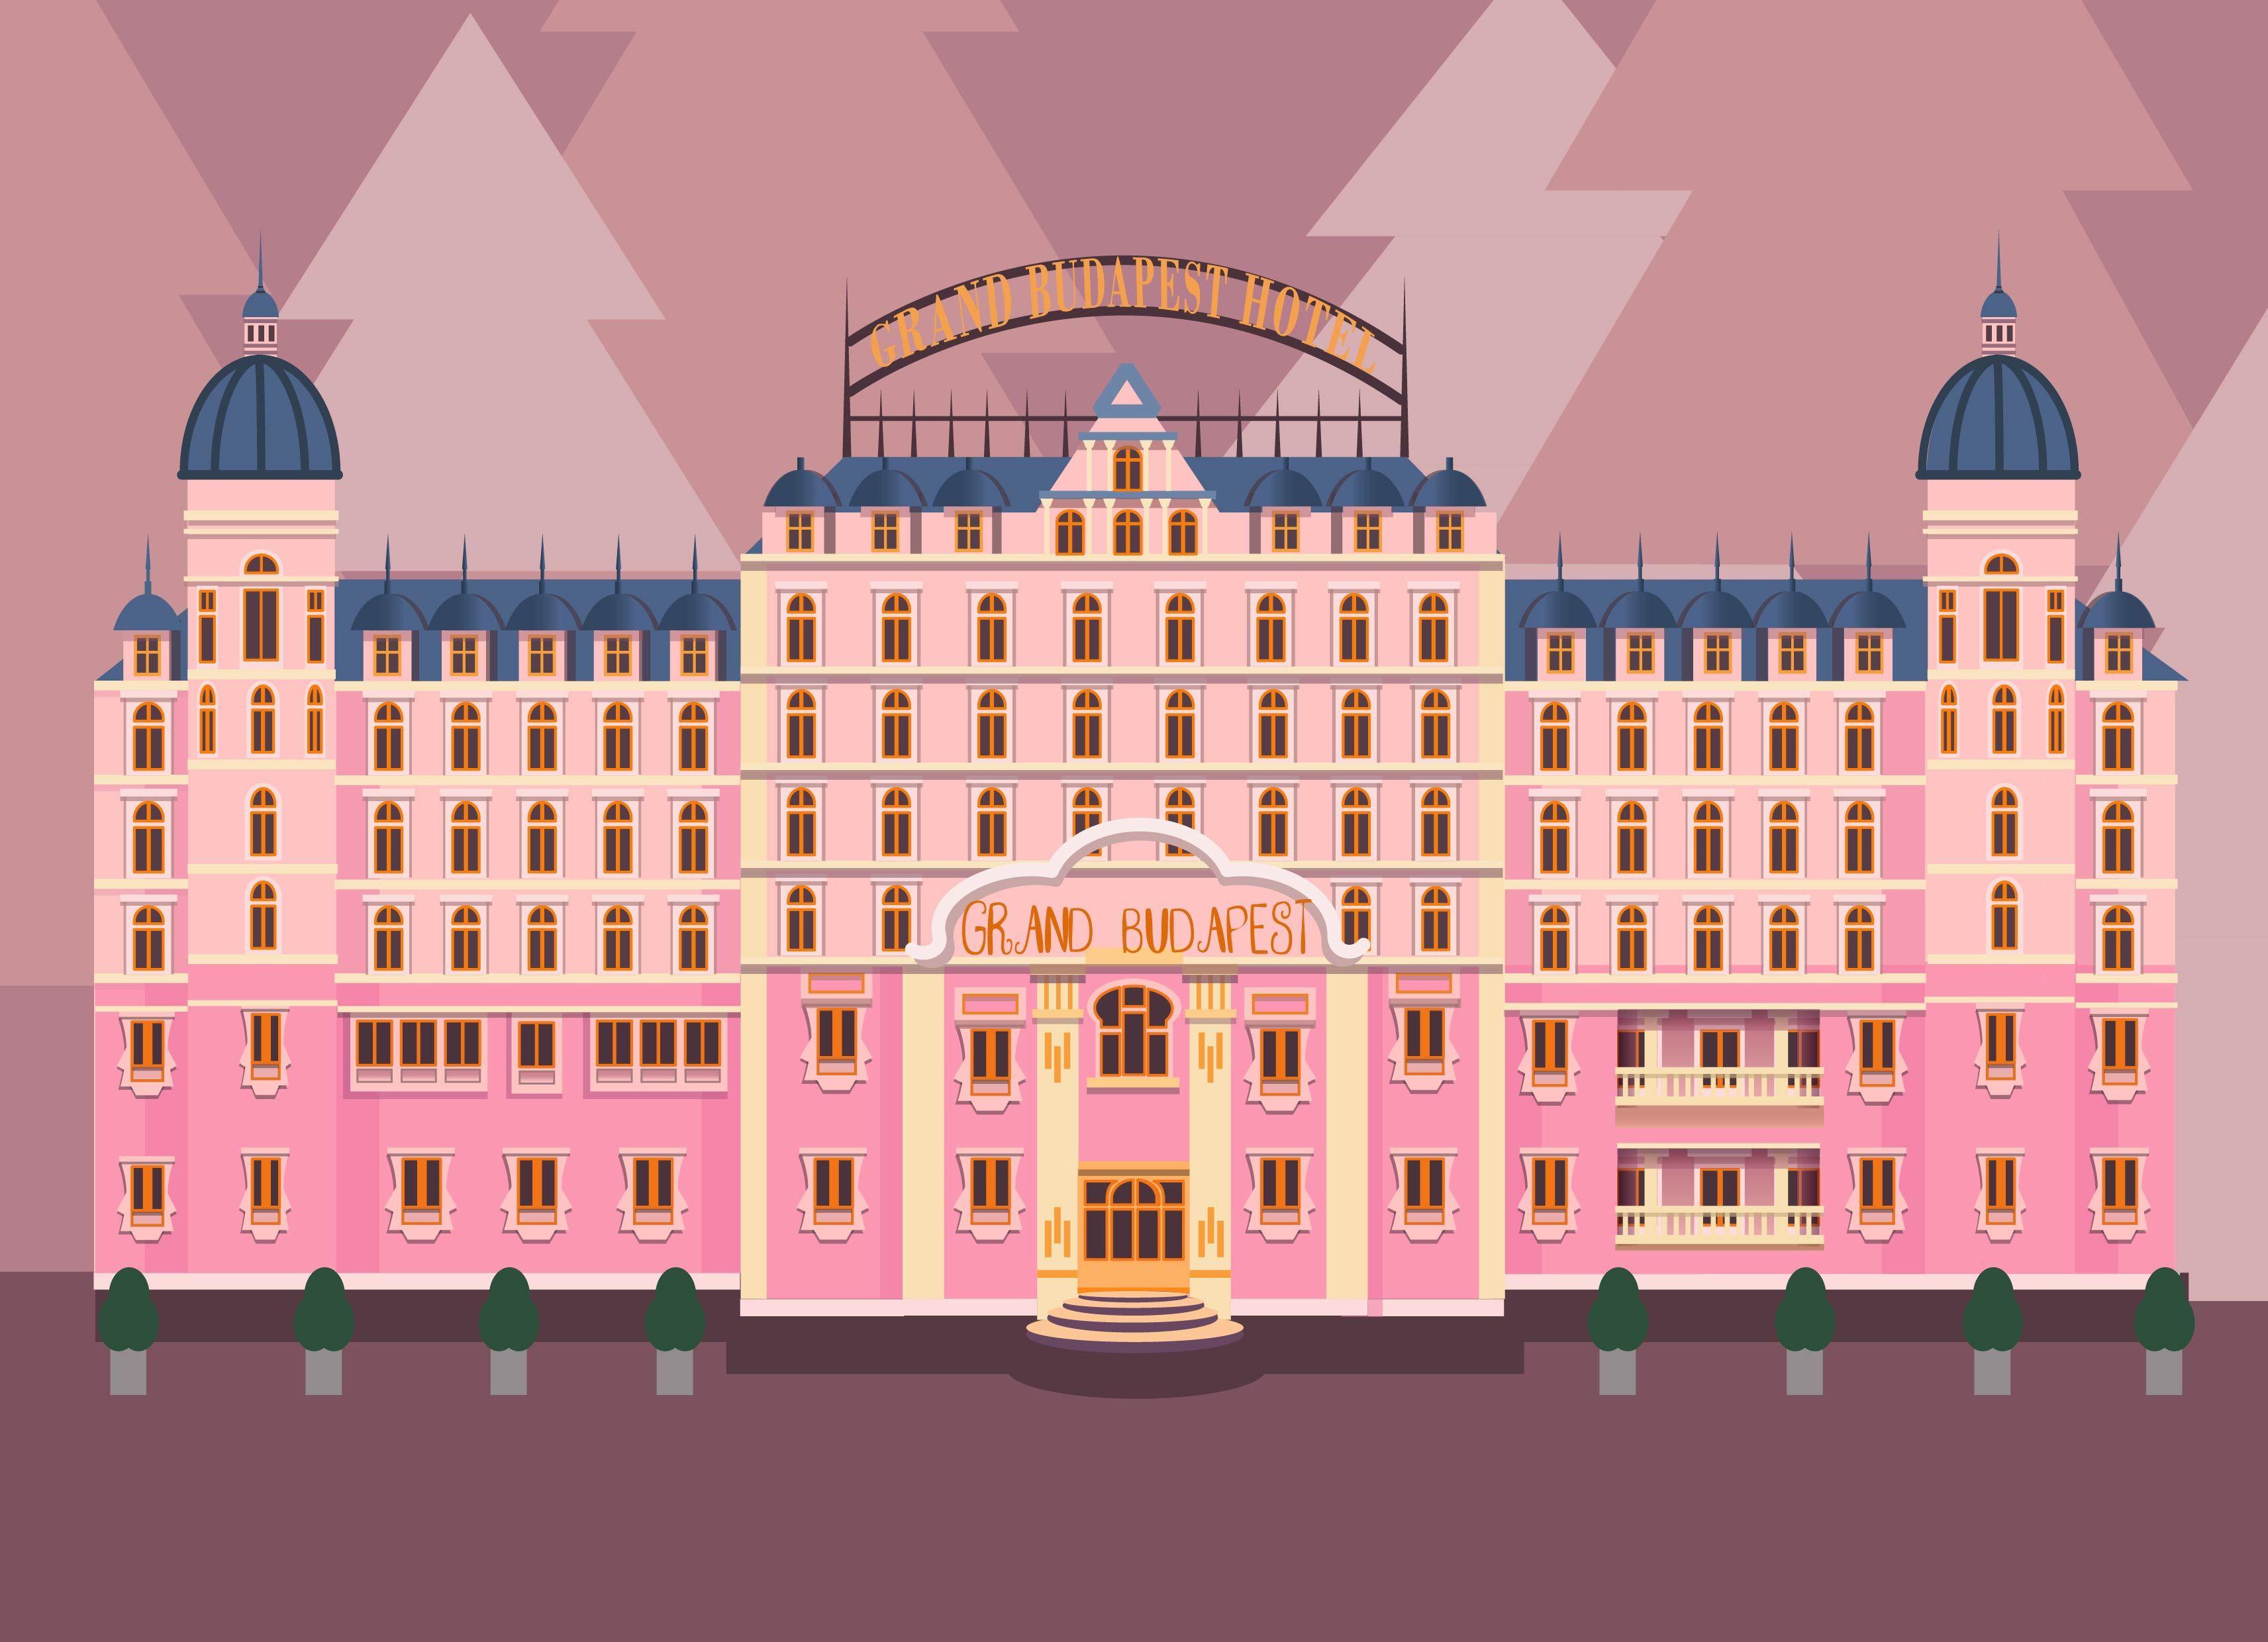 the grand budapest hotel illustration artwork instagram ye nn. Black Bedroom Furniture Sets. Home Design Ideas